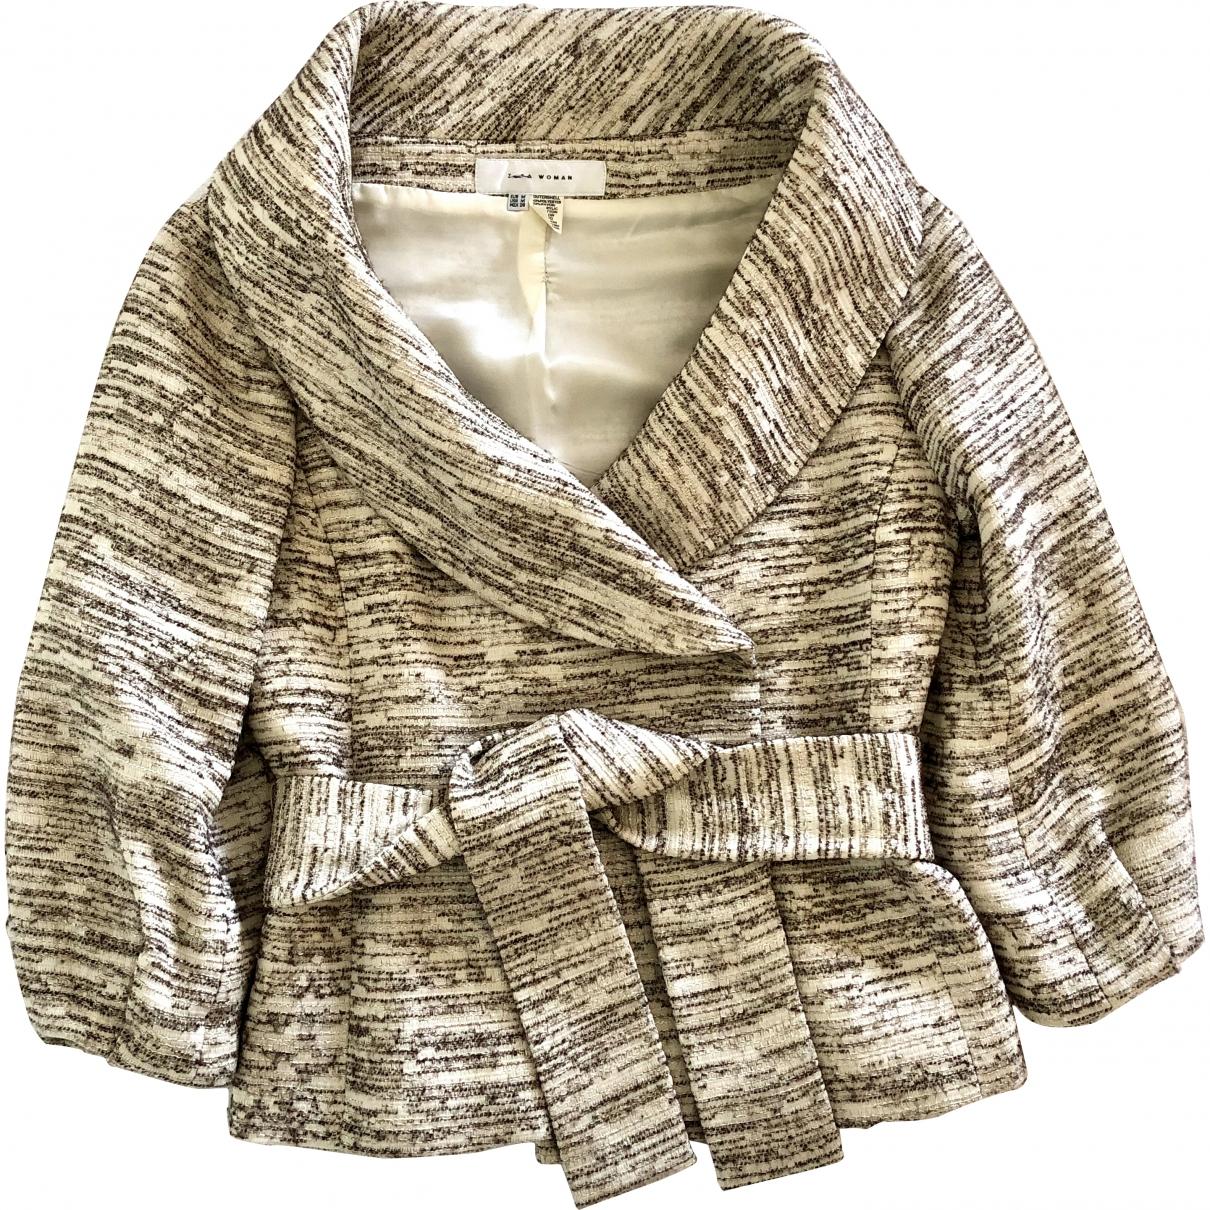 Zara \N Beige coat for Women M International